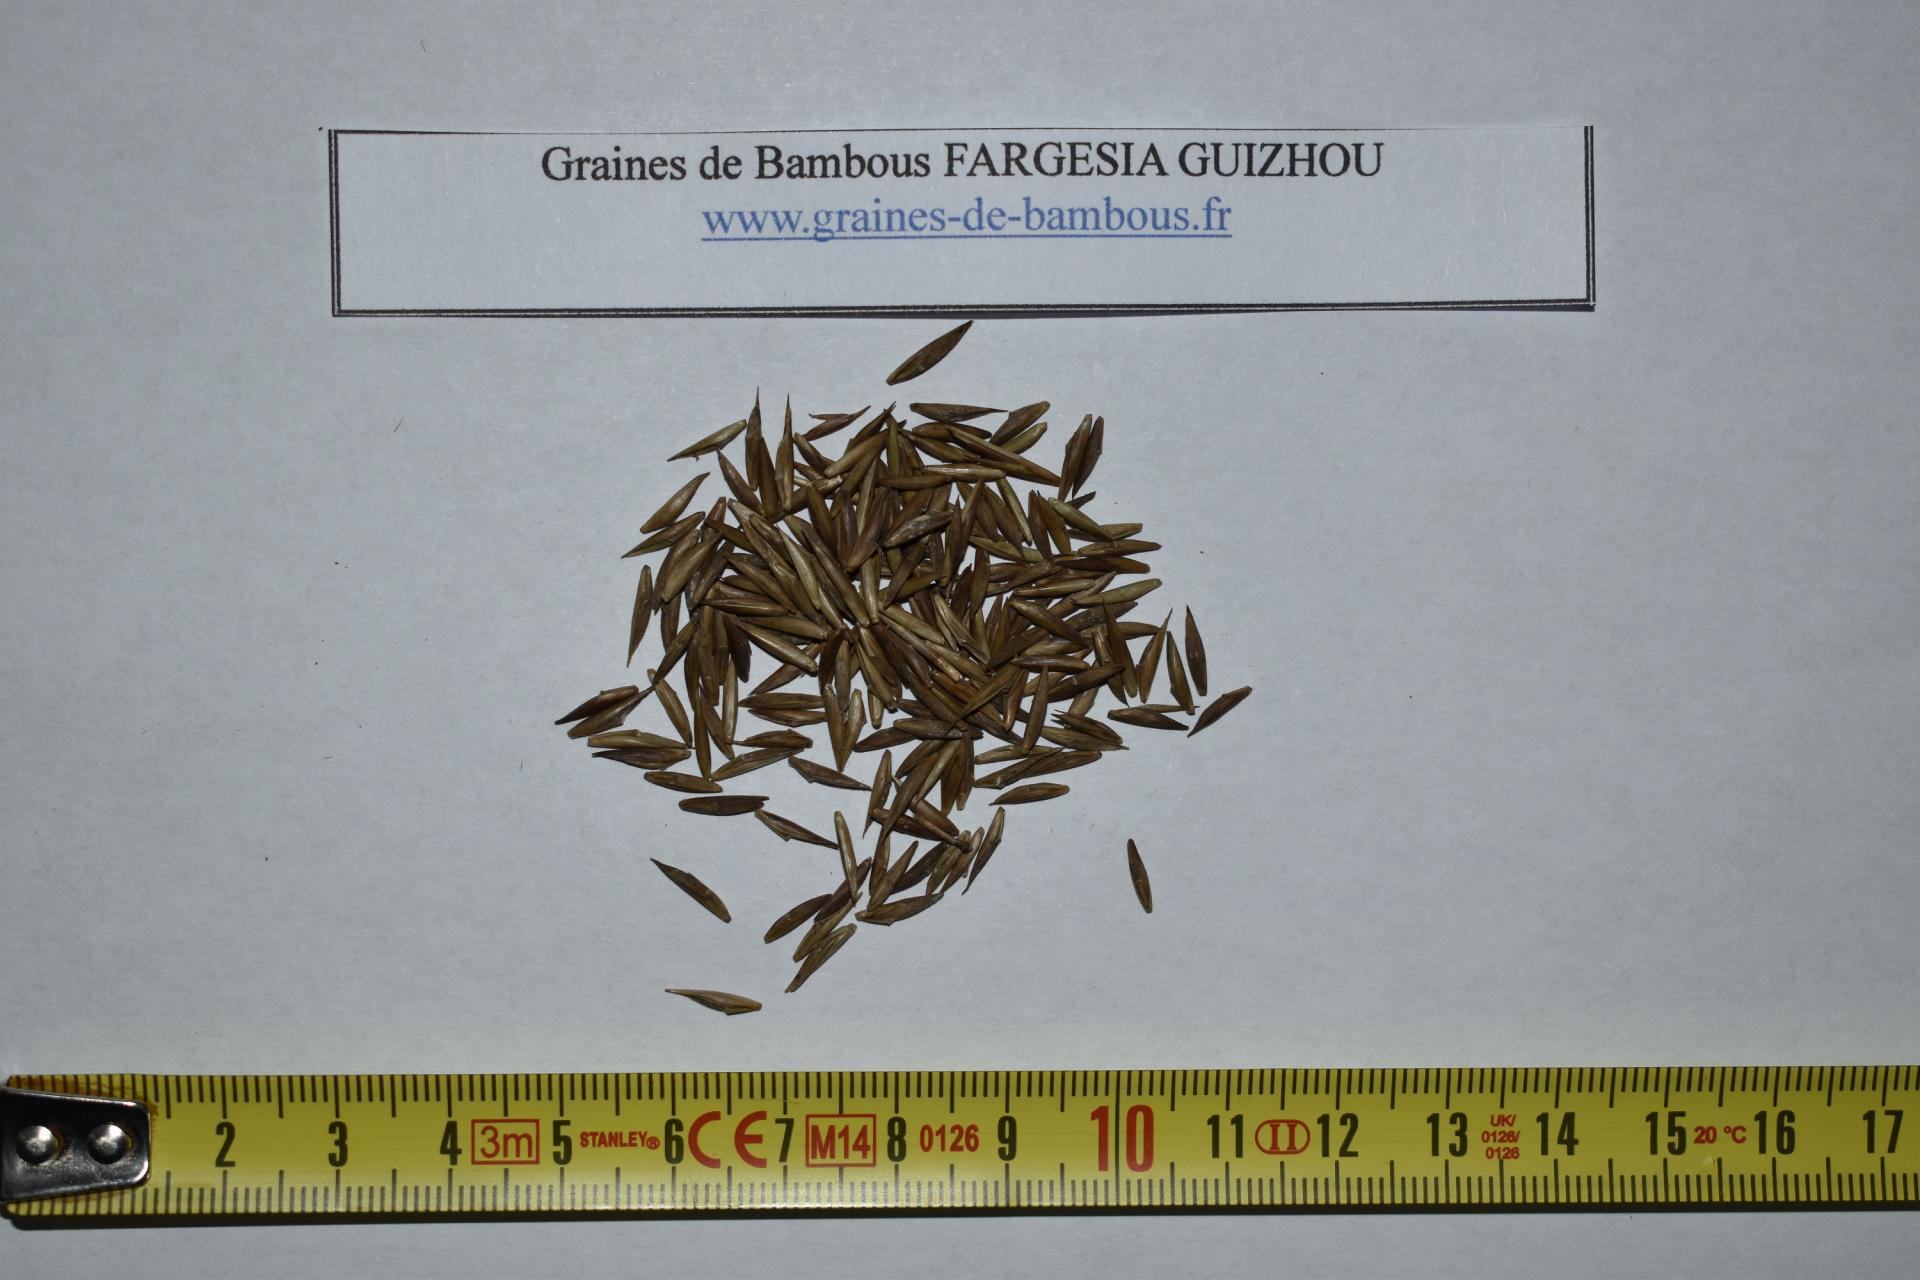 Seeds fargesia guizhou graines de bambous fr